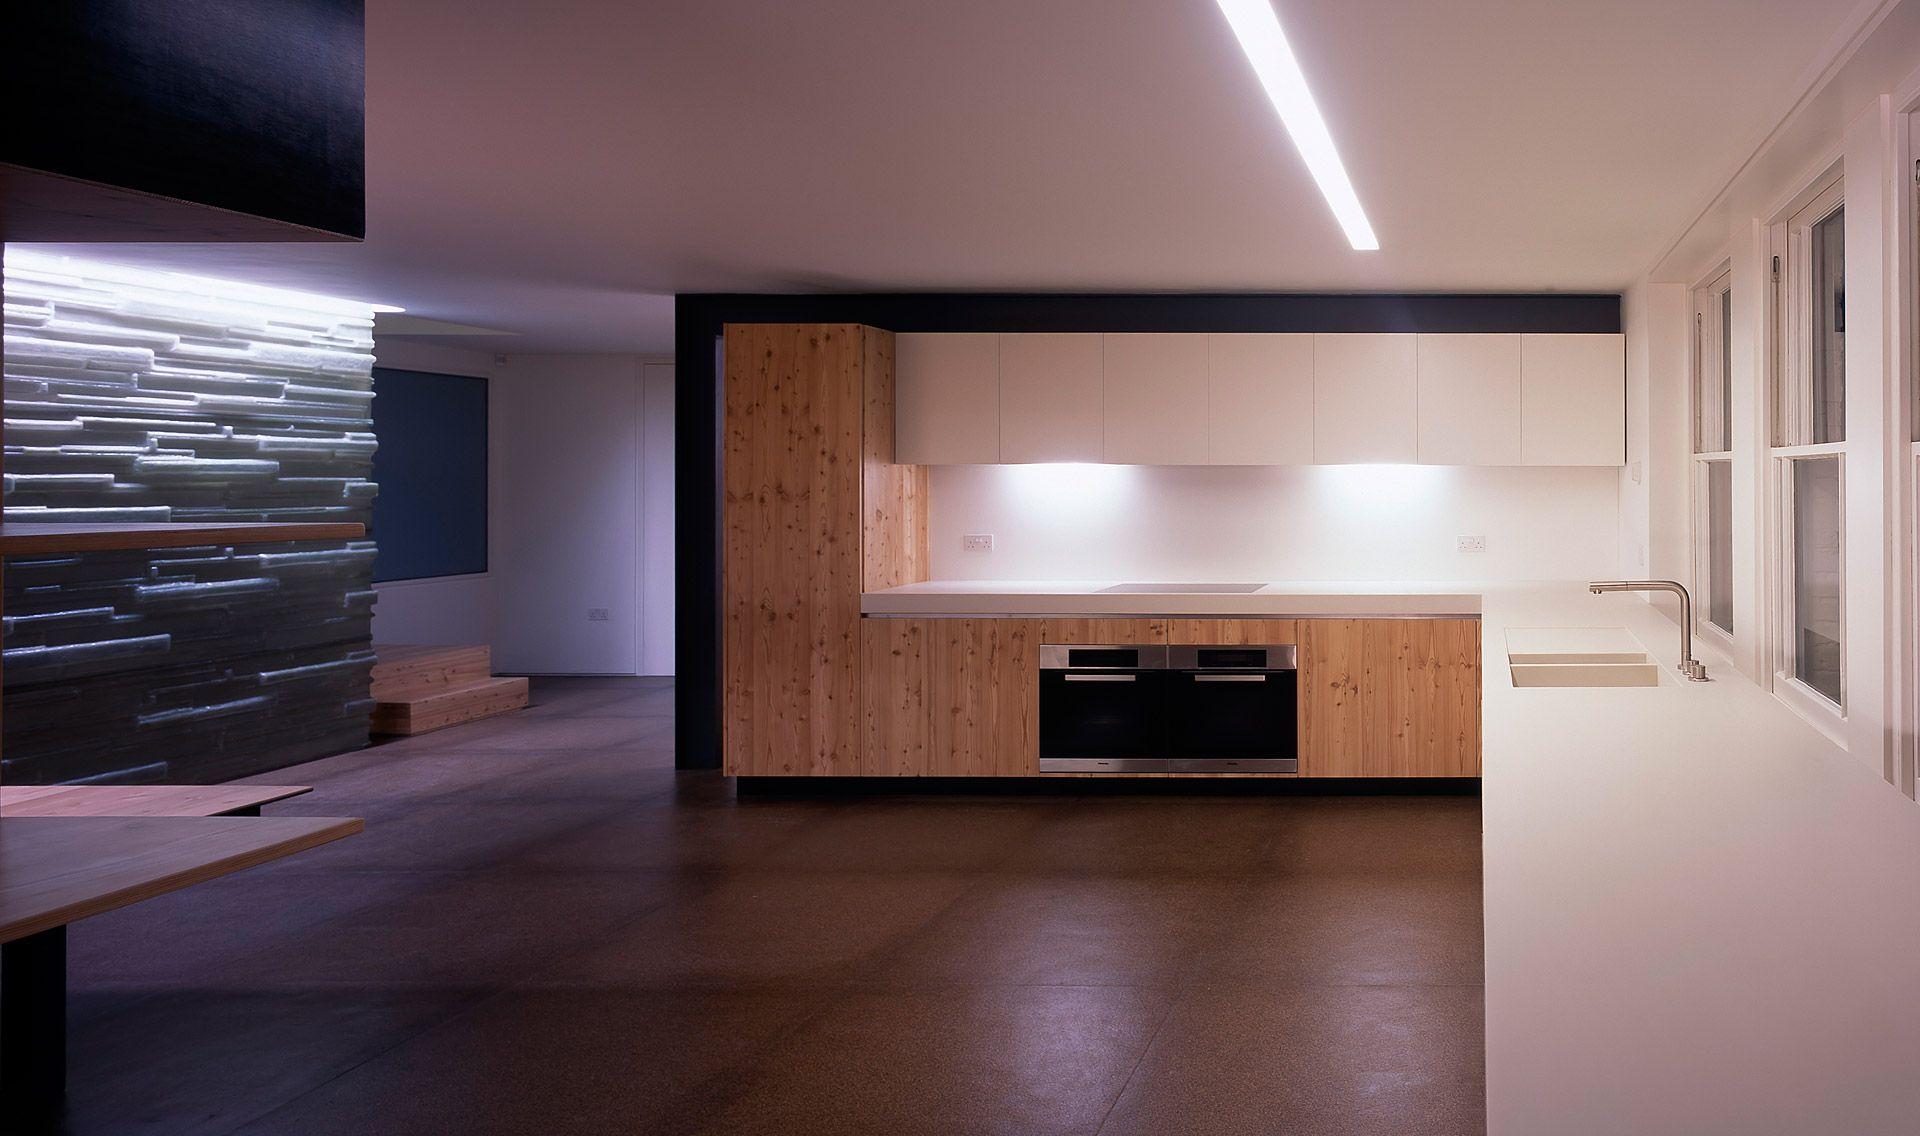 Kitchens perren street tintab contemporary bespoke for Small kitchen wardrobe